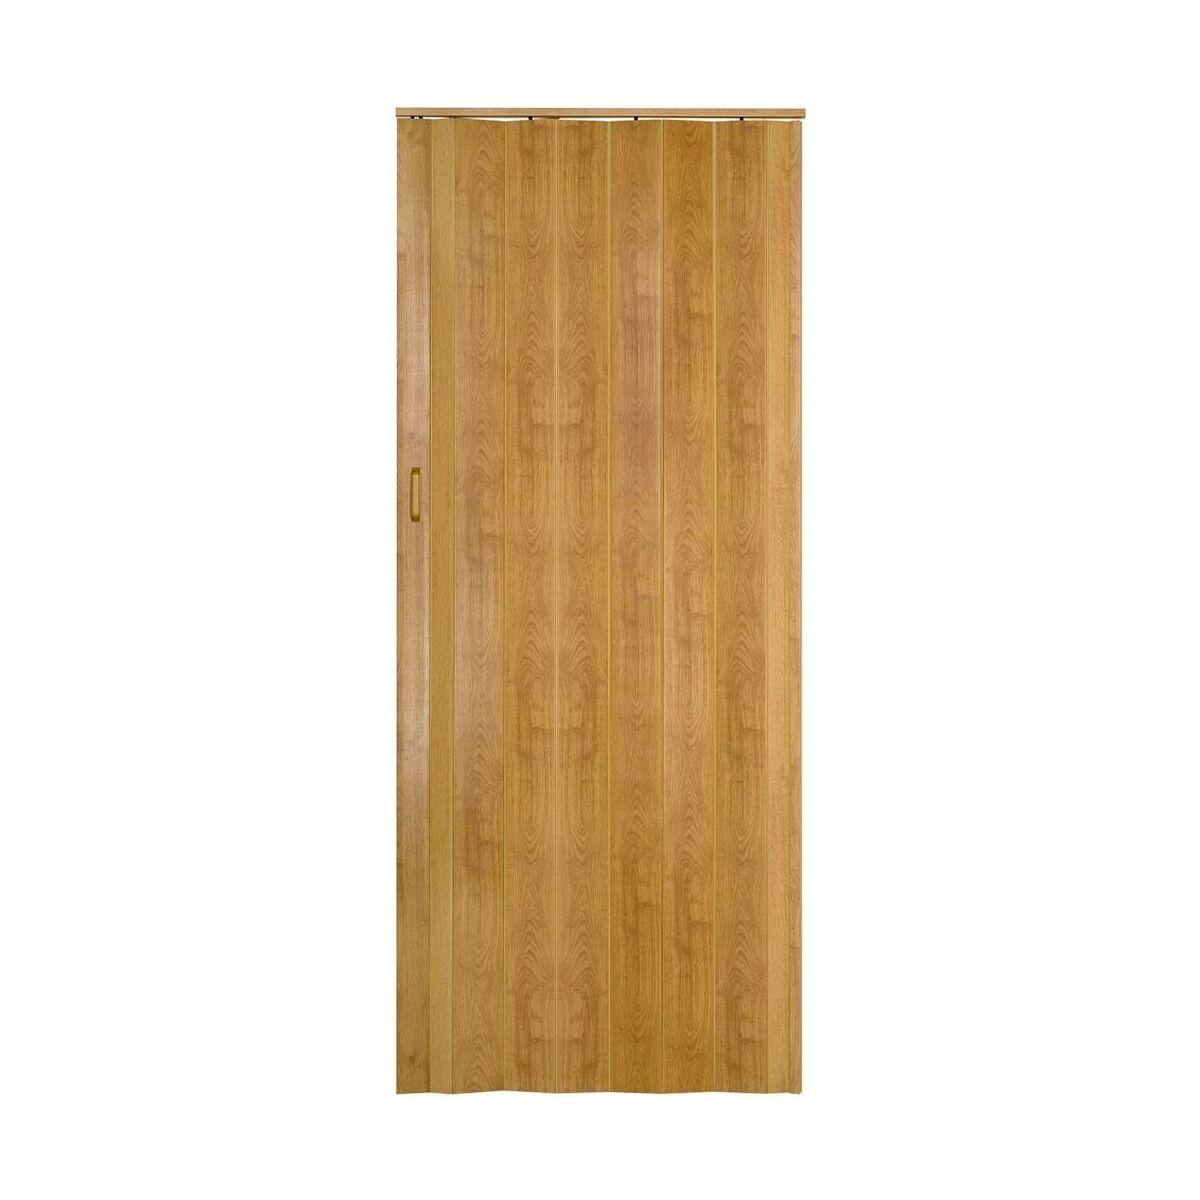 drzwi harmonijkowe st 2 sprawd opinie w leroy merlin. Black Bedroom Furniture Sets. Home Design Ideas